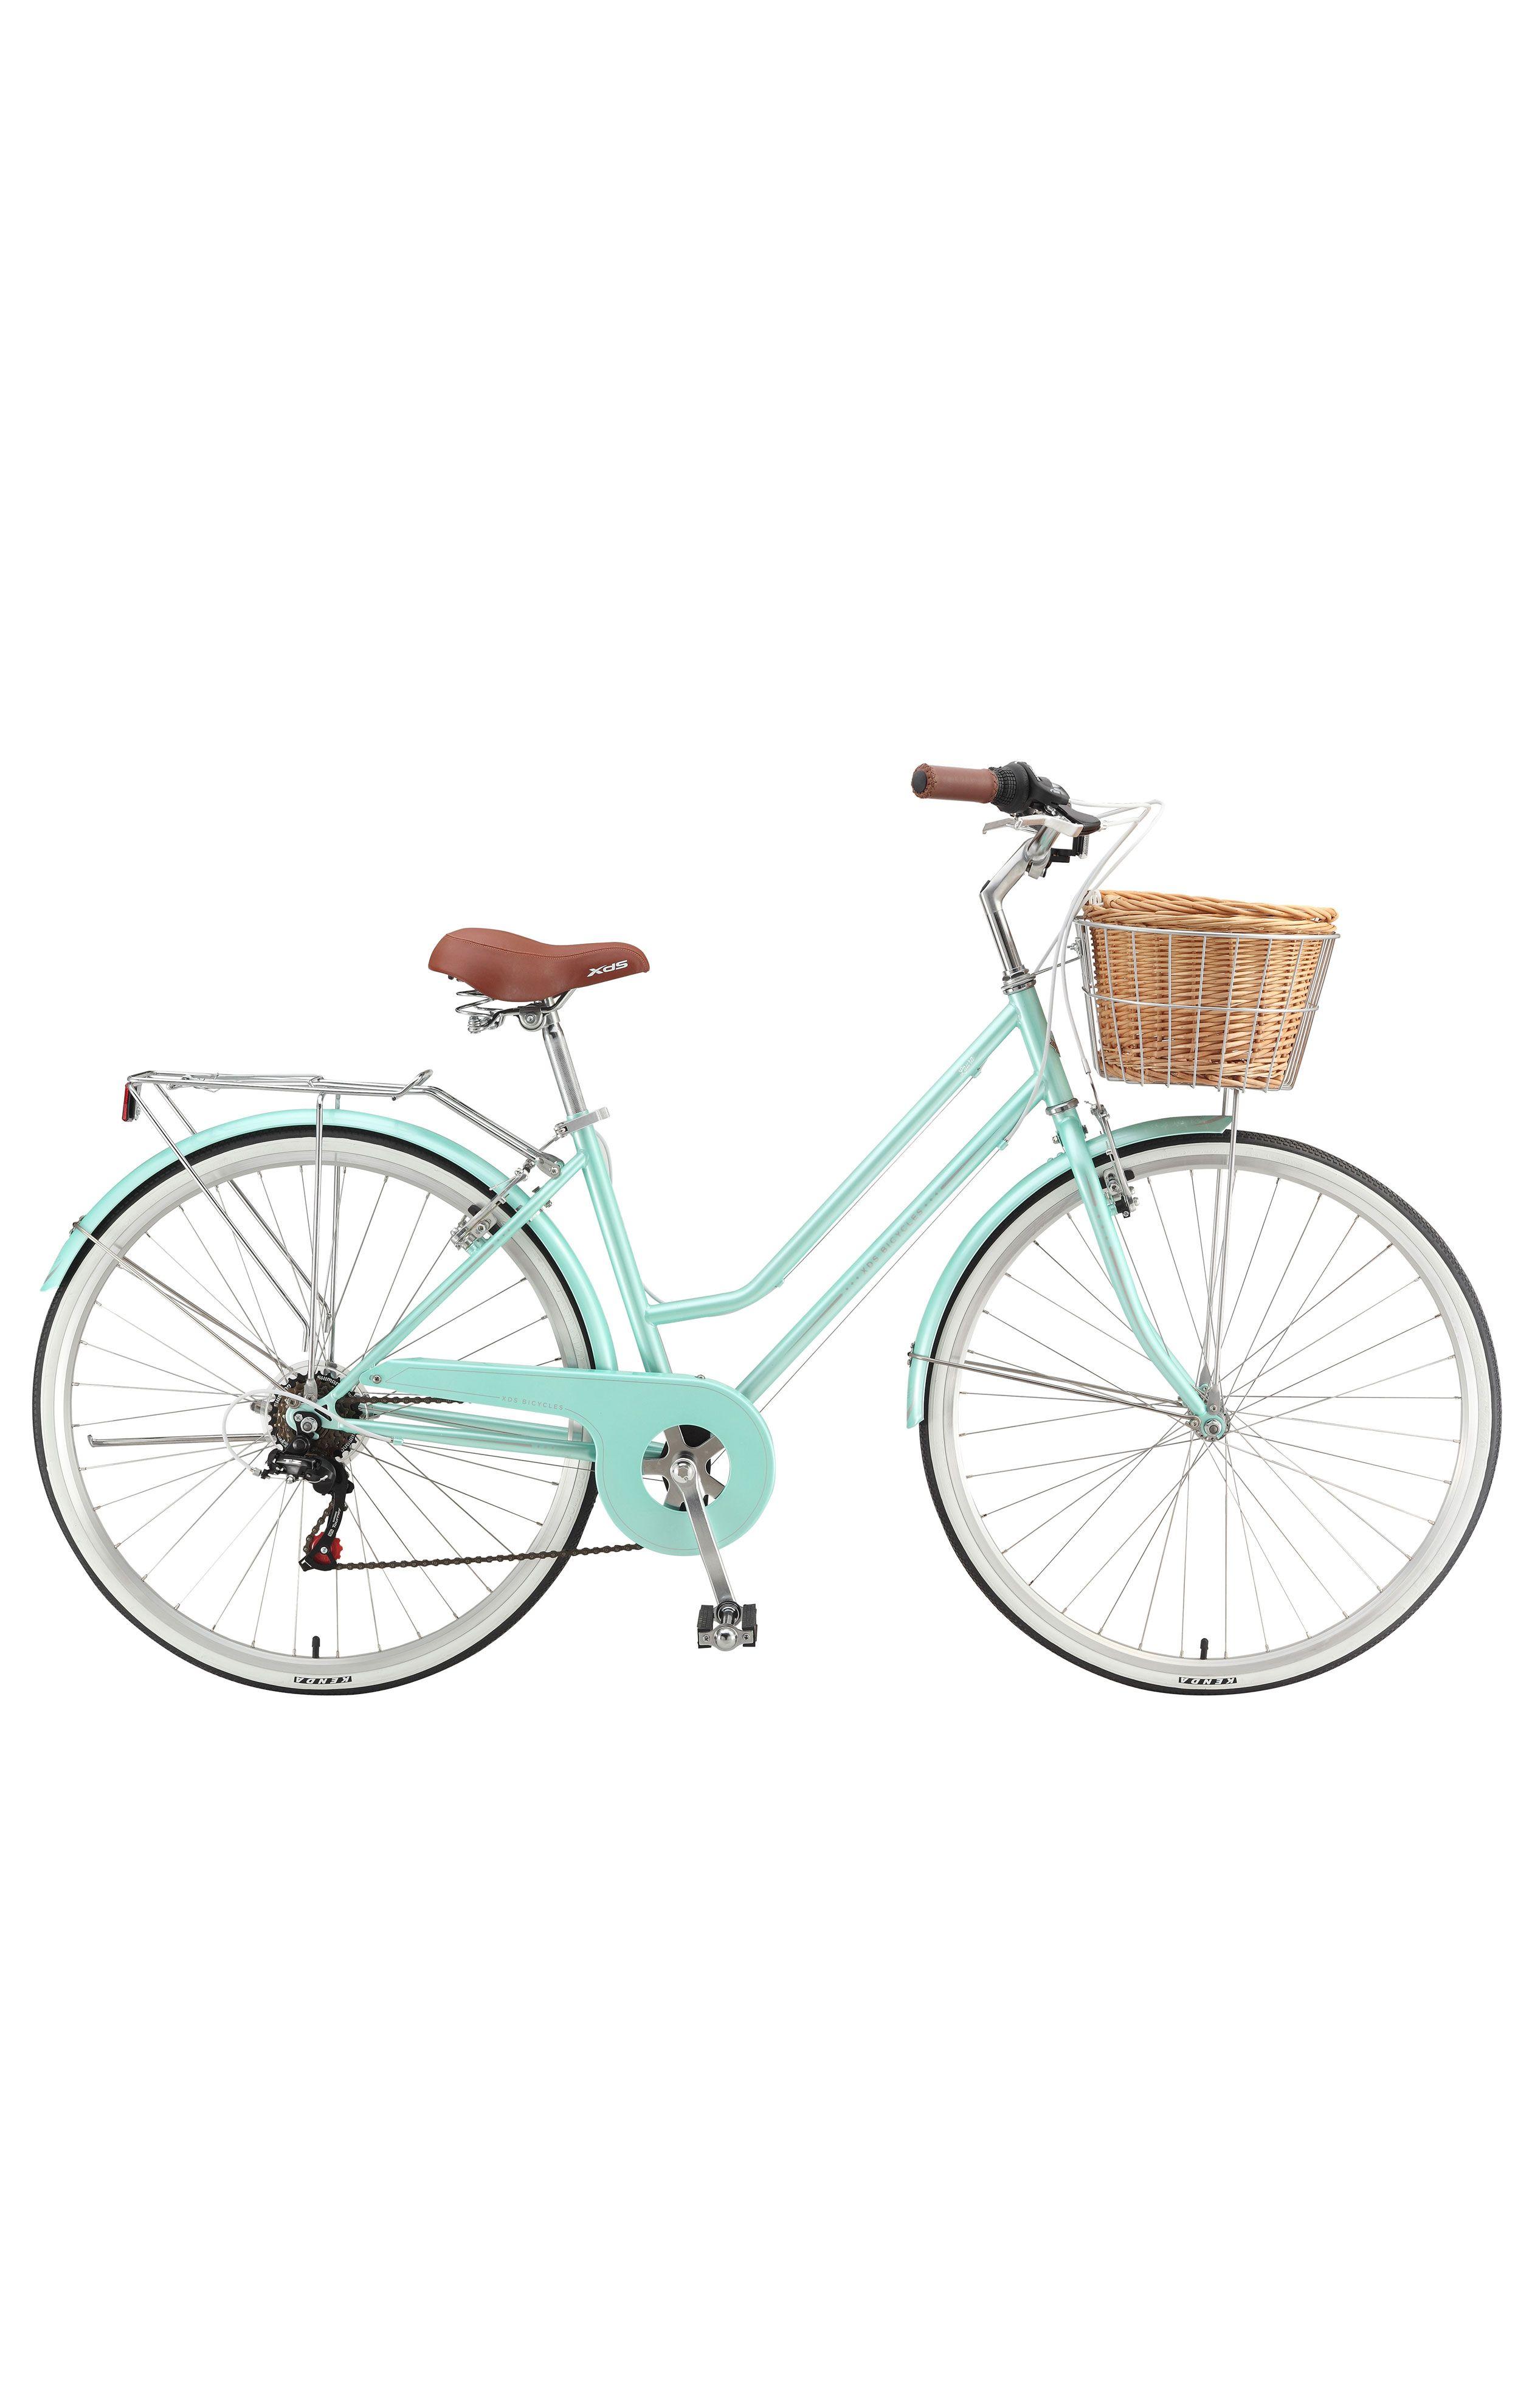 7f06ea2d4de A retro womens bike with a wicker basket fitness and healthy jpg 2520x3960 Womens  bike with